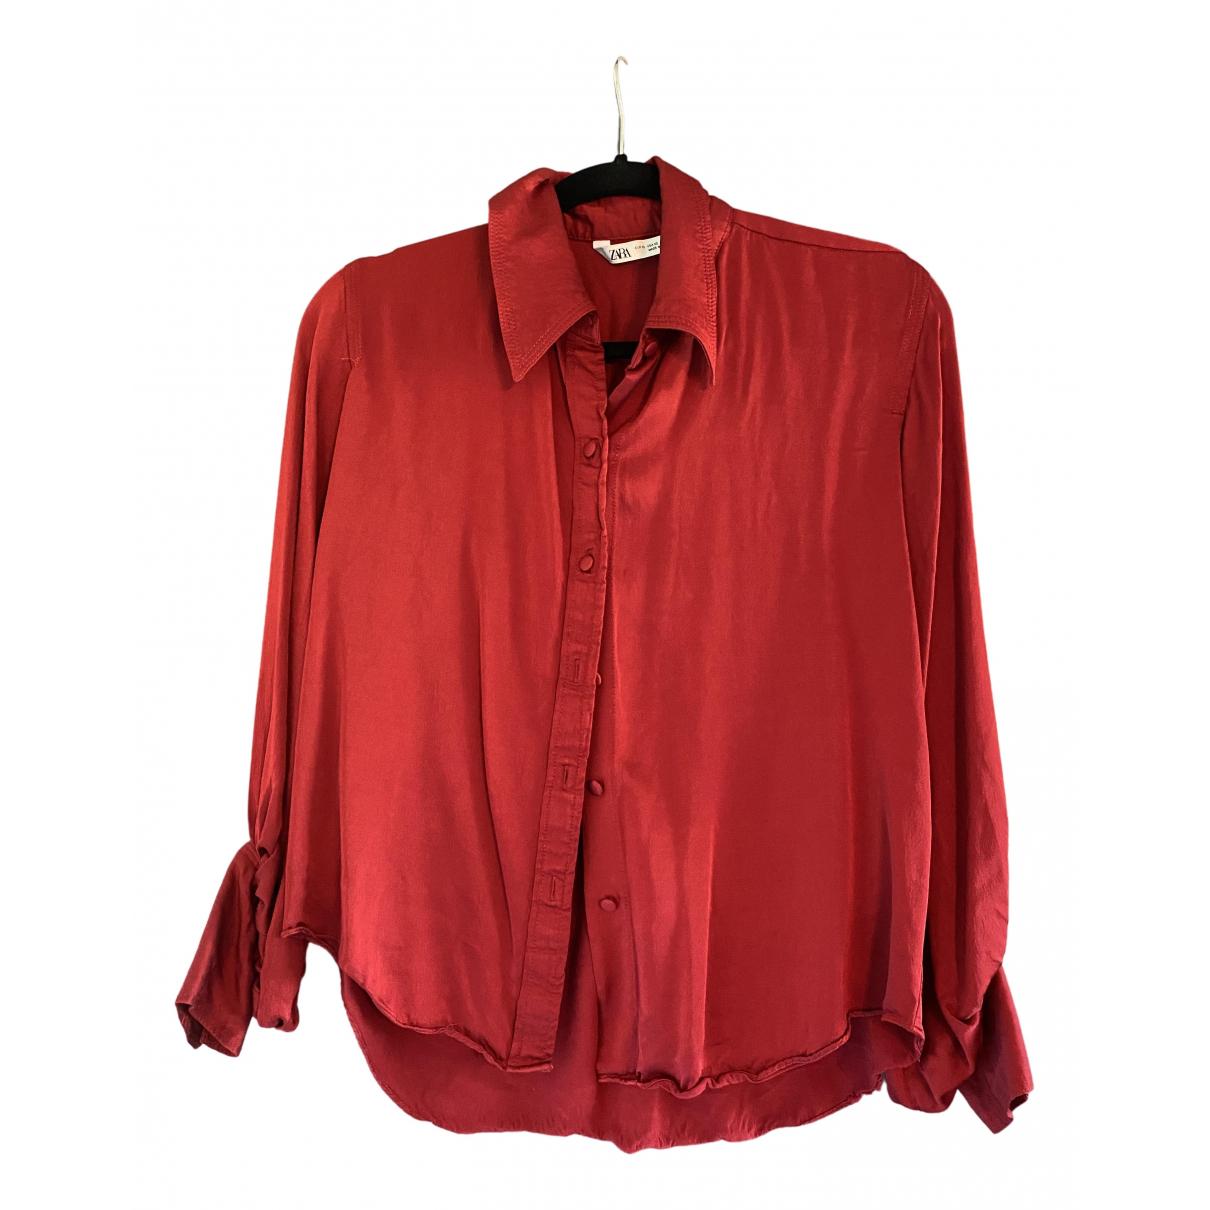 Zara \N Red  top for Women XS International